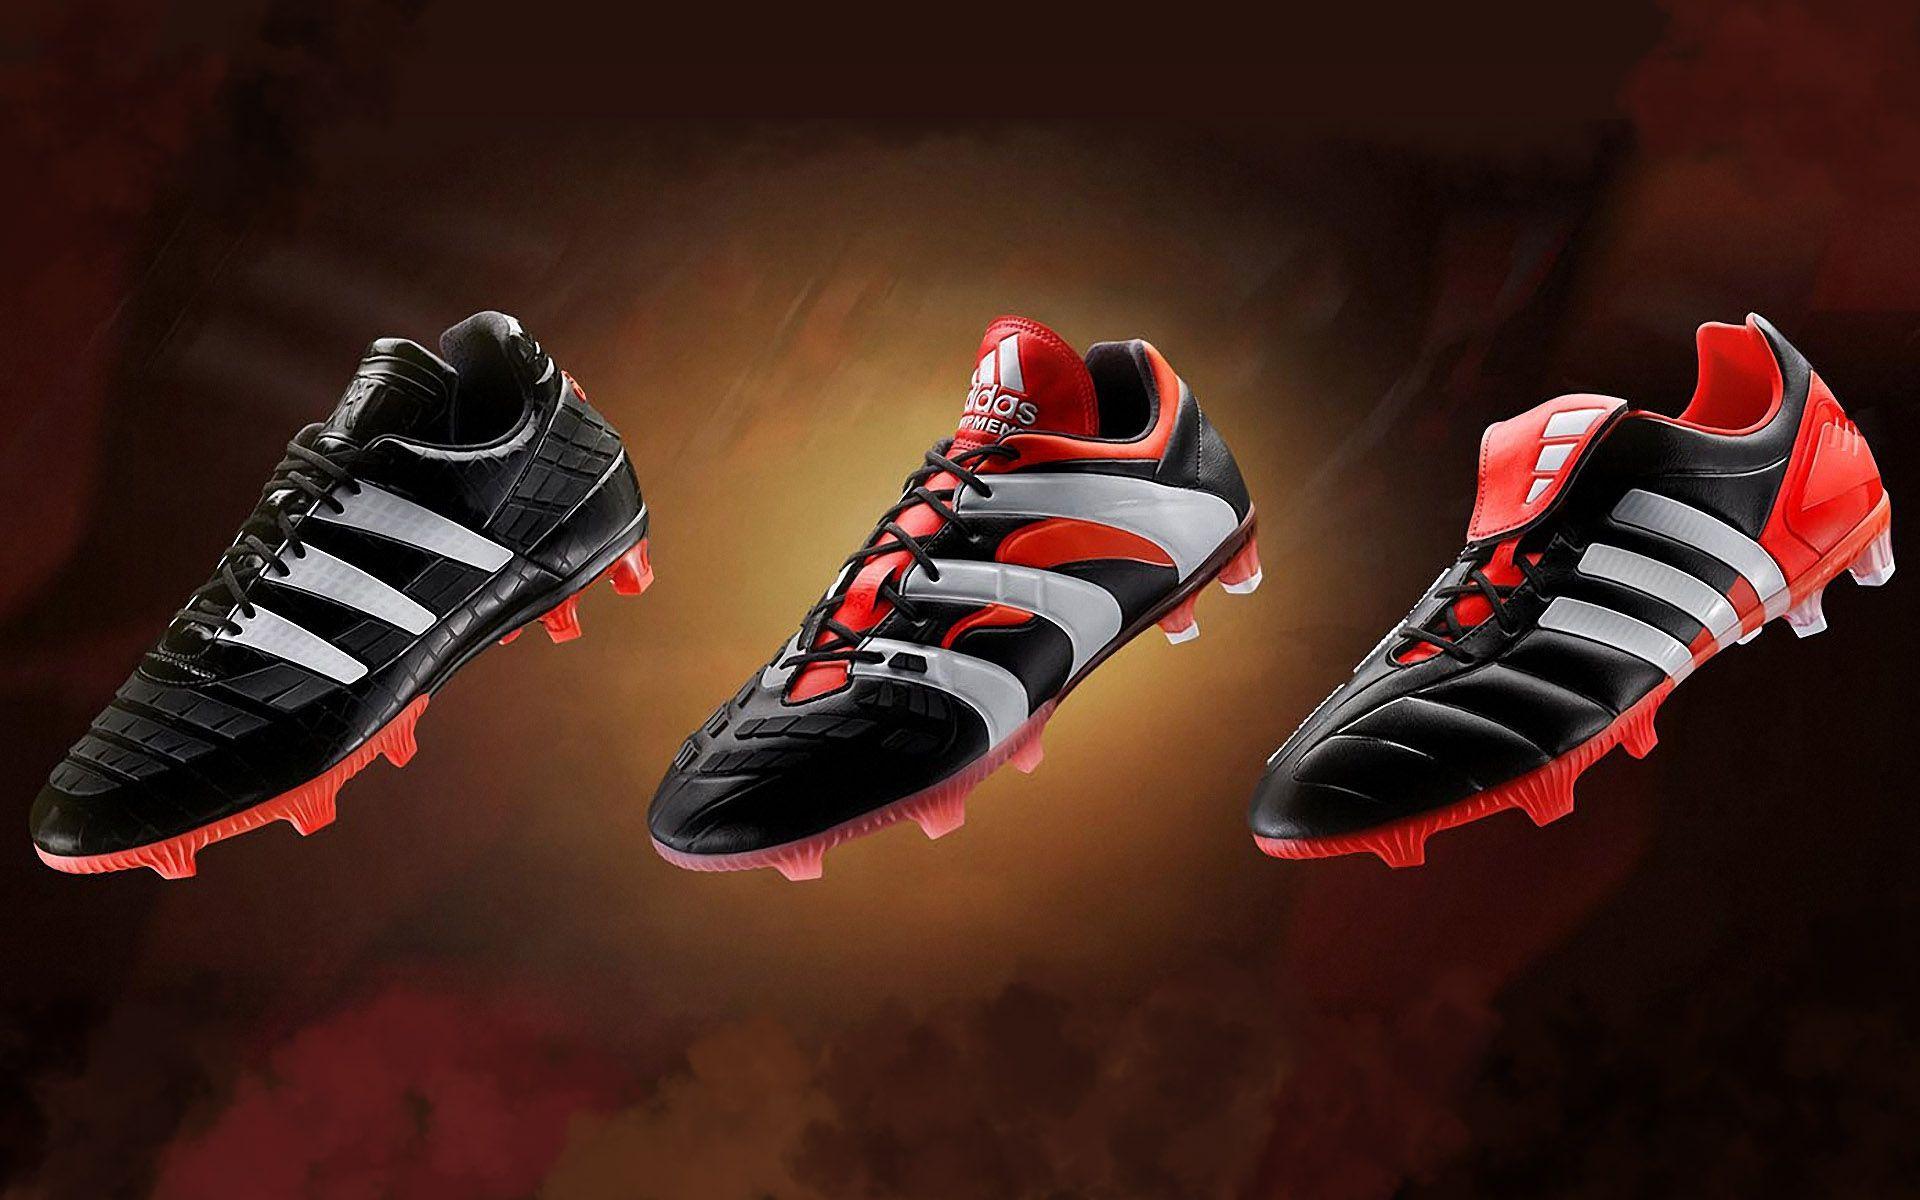 Download 1920x1200 Adidas Predator Revenge Pack Boots Wallpaper Predator Boots Adidas Predator Predator Football Boots